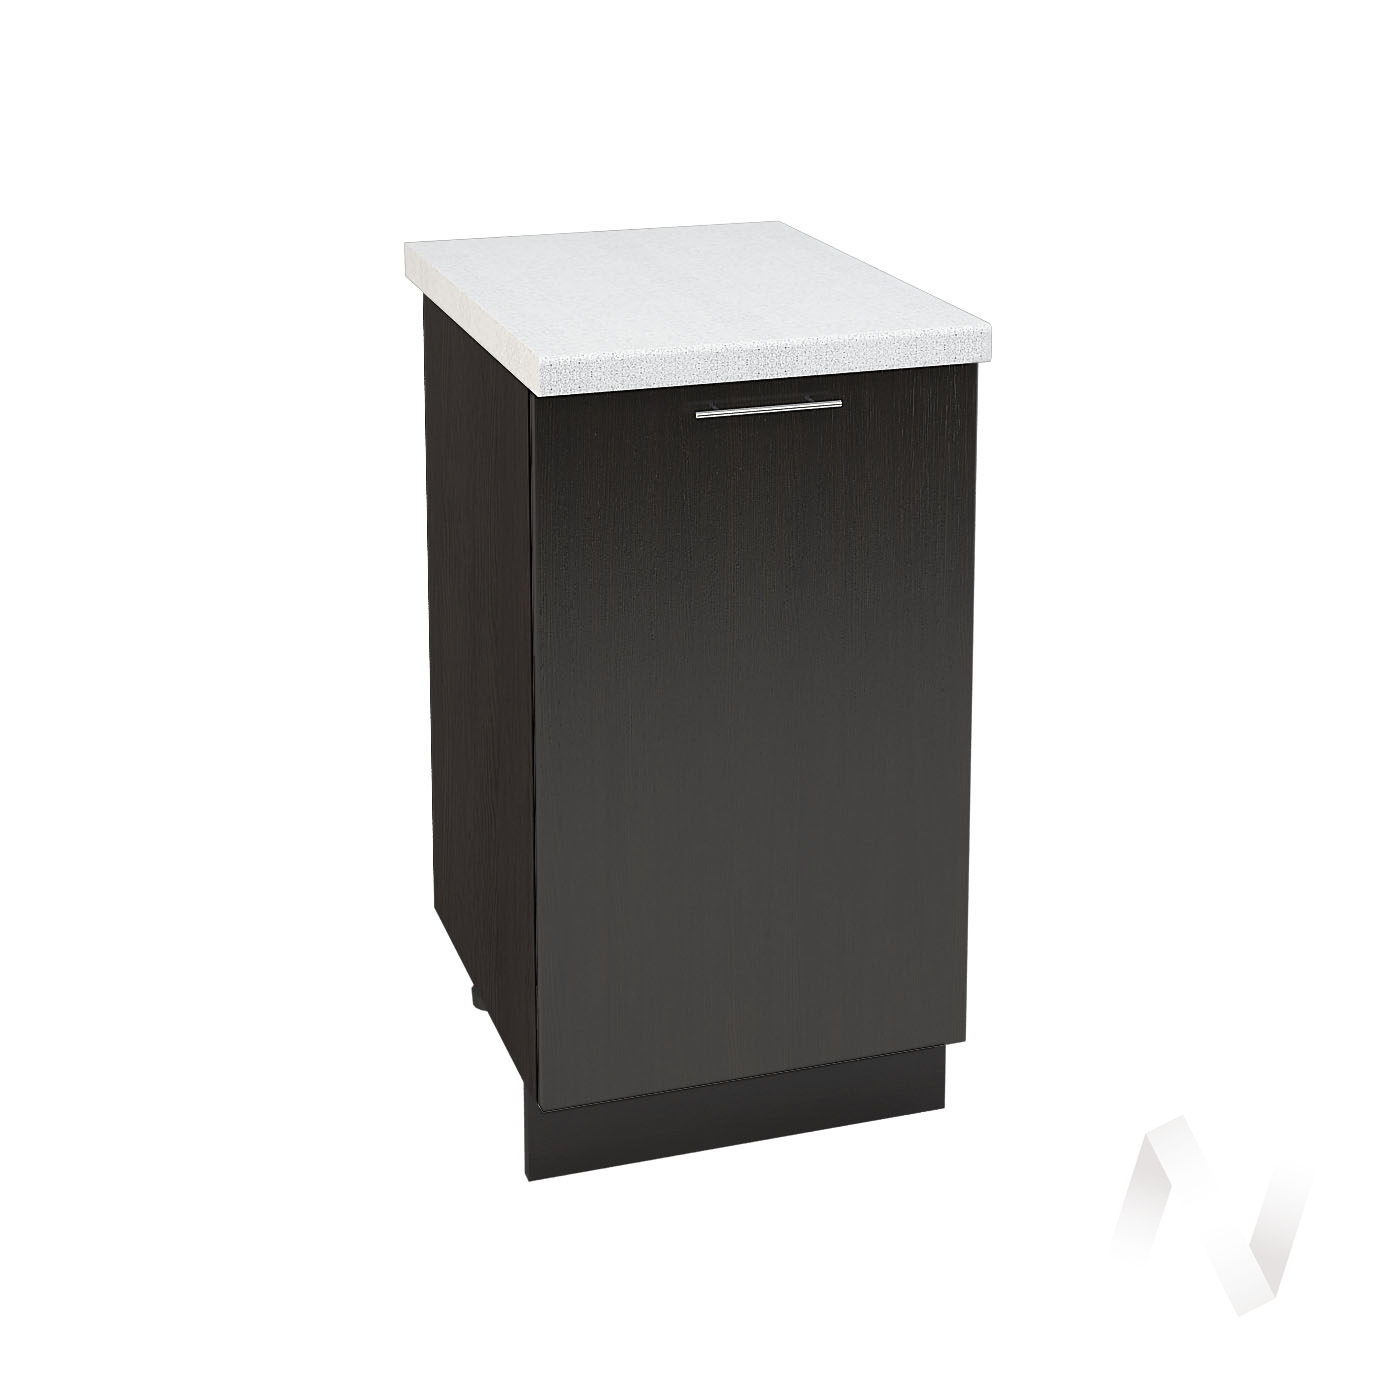 "Кухня ""Валерия-М"": Шкаф нижний 450, ШН 450 (венге/корпус венге)"